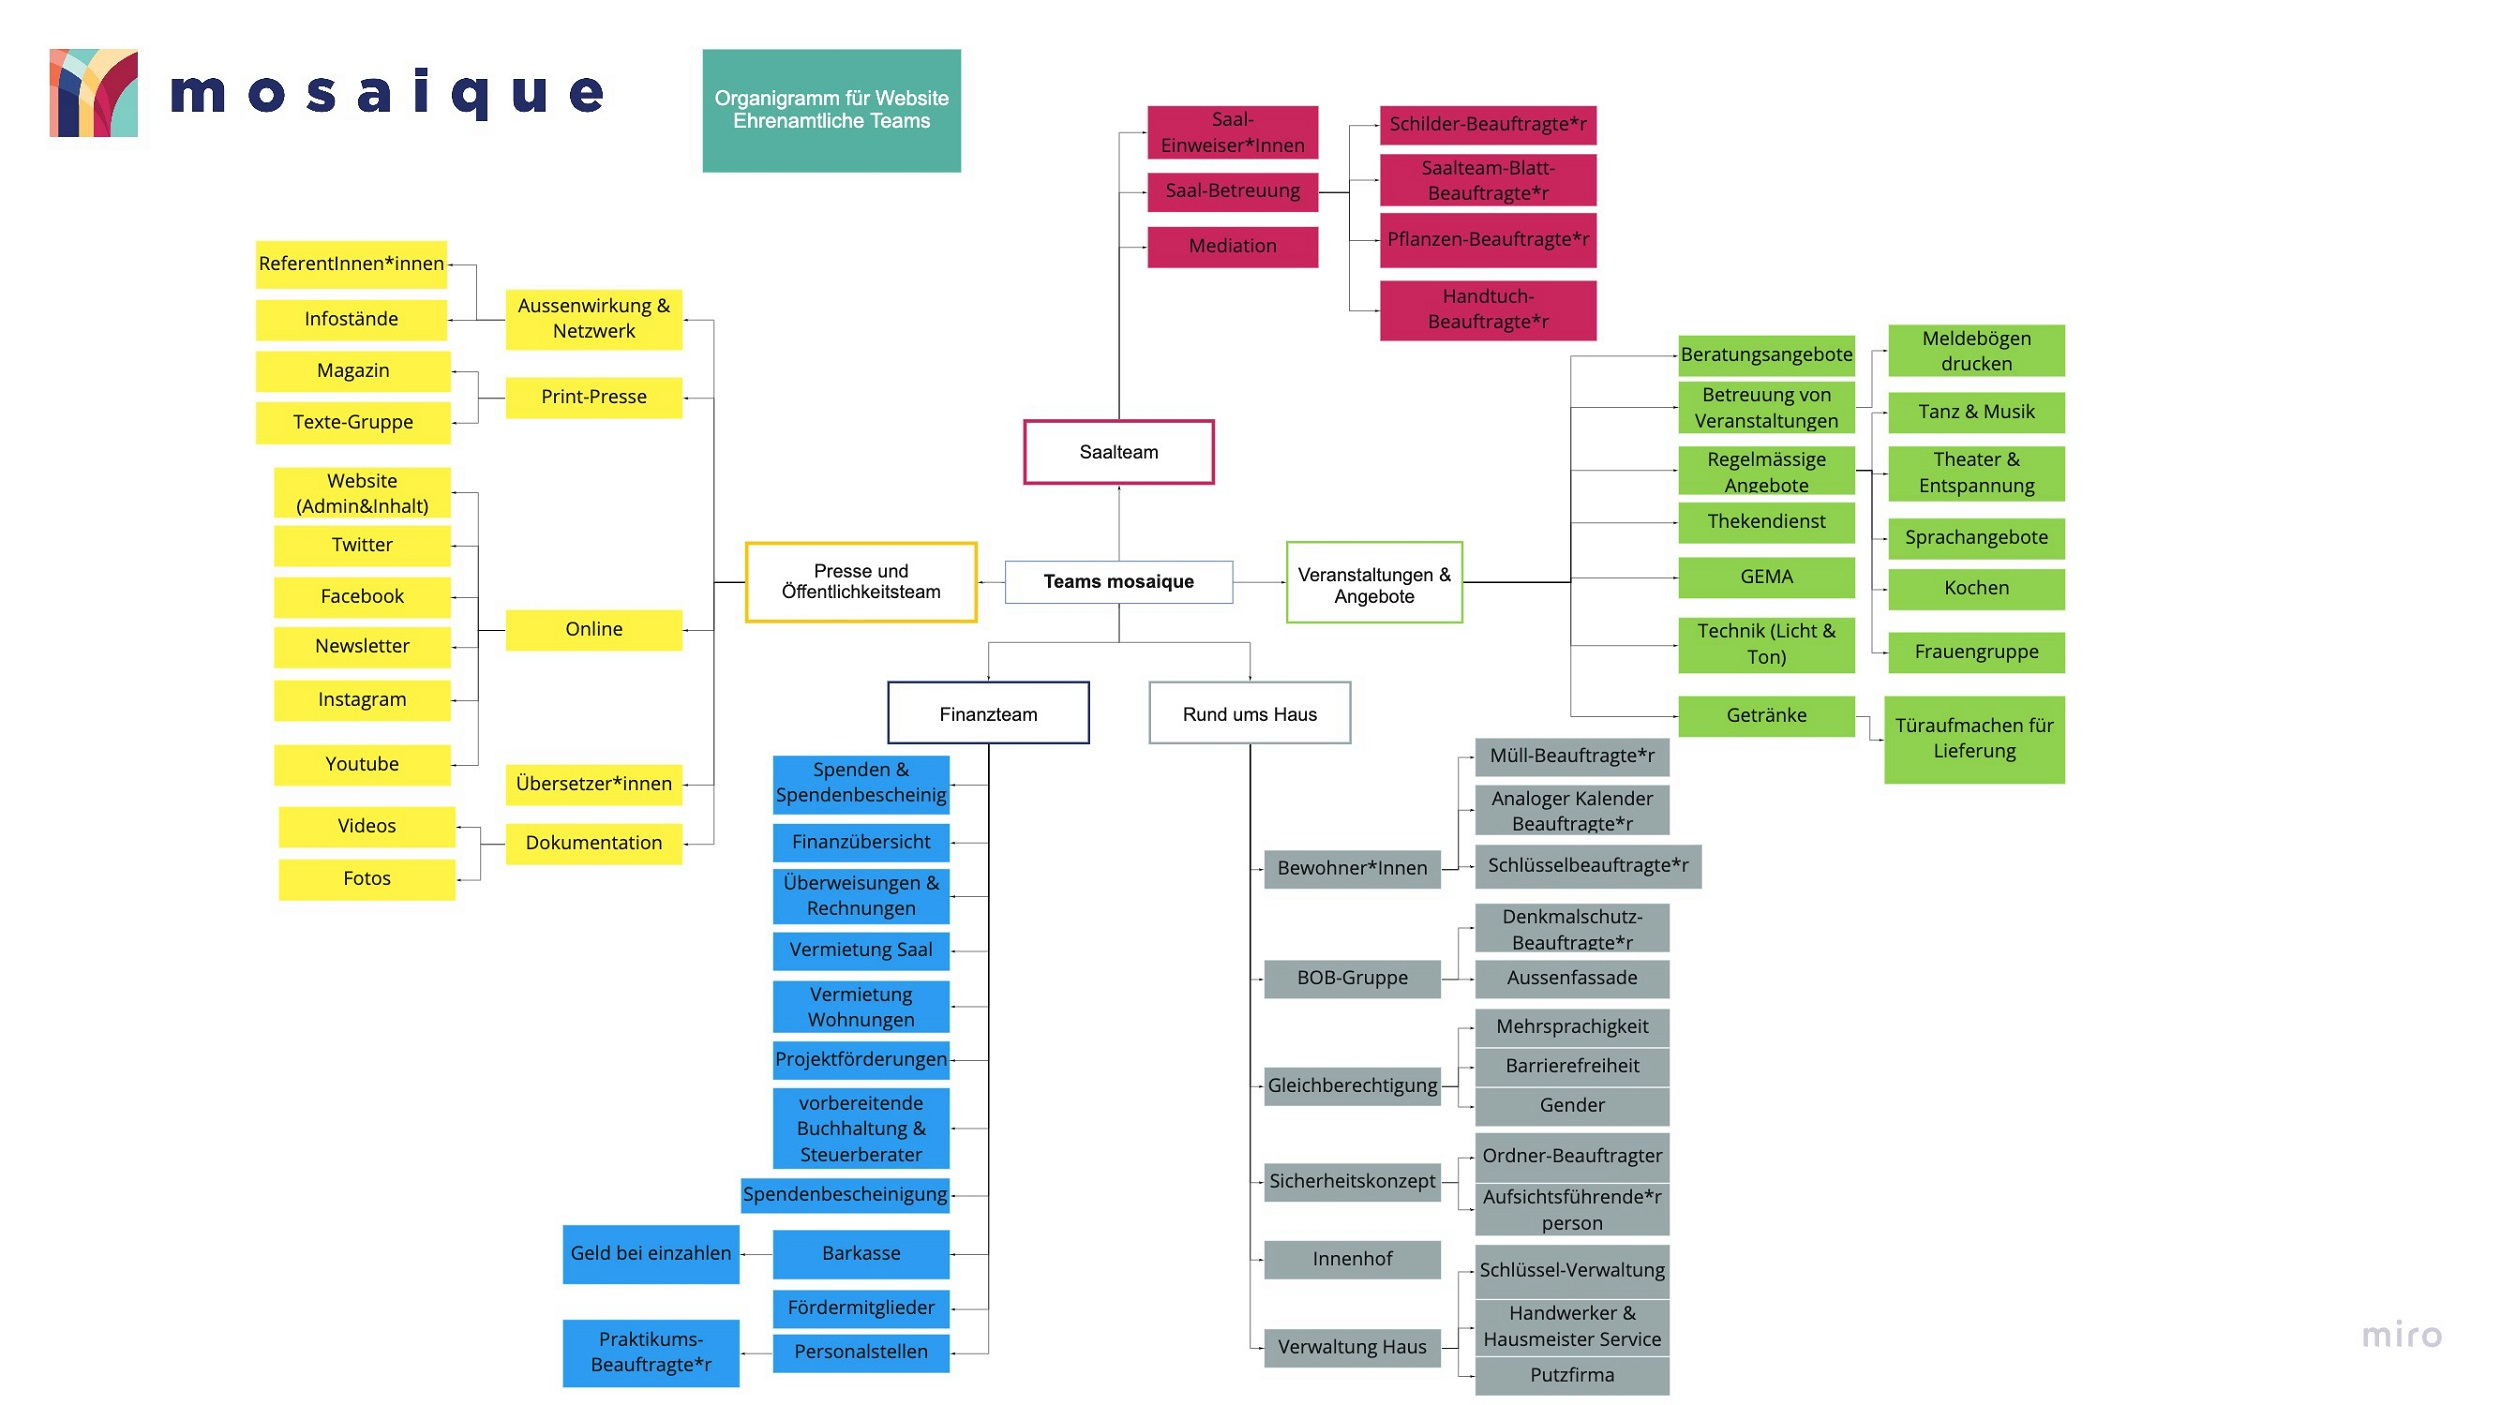 mosaique Organigram - Teams